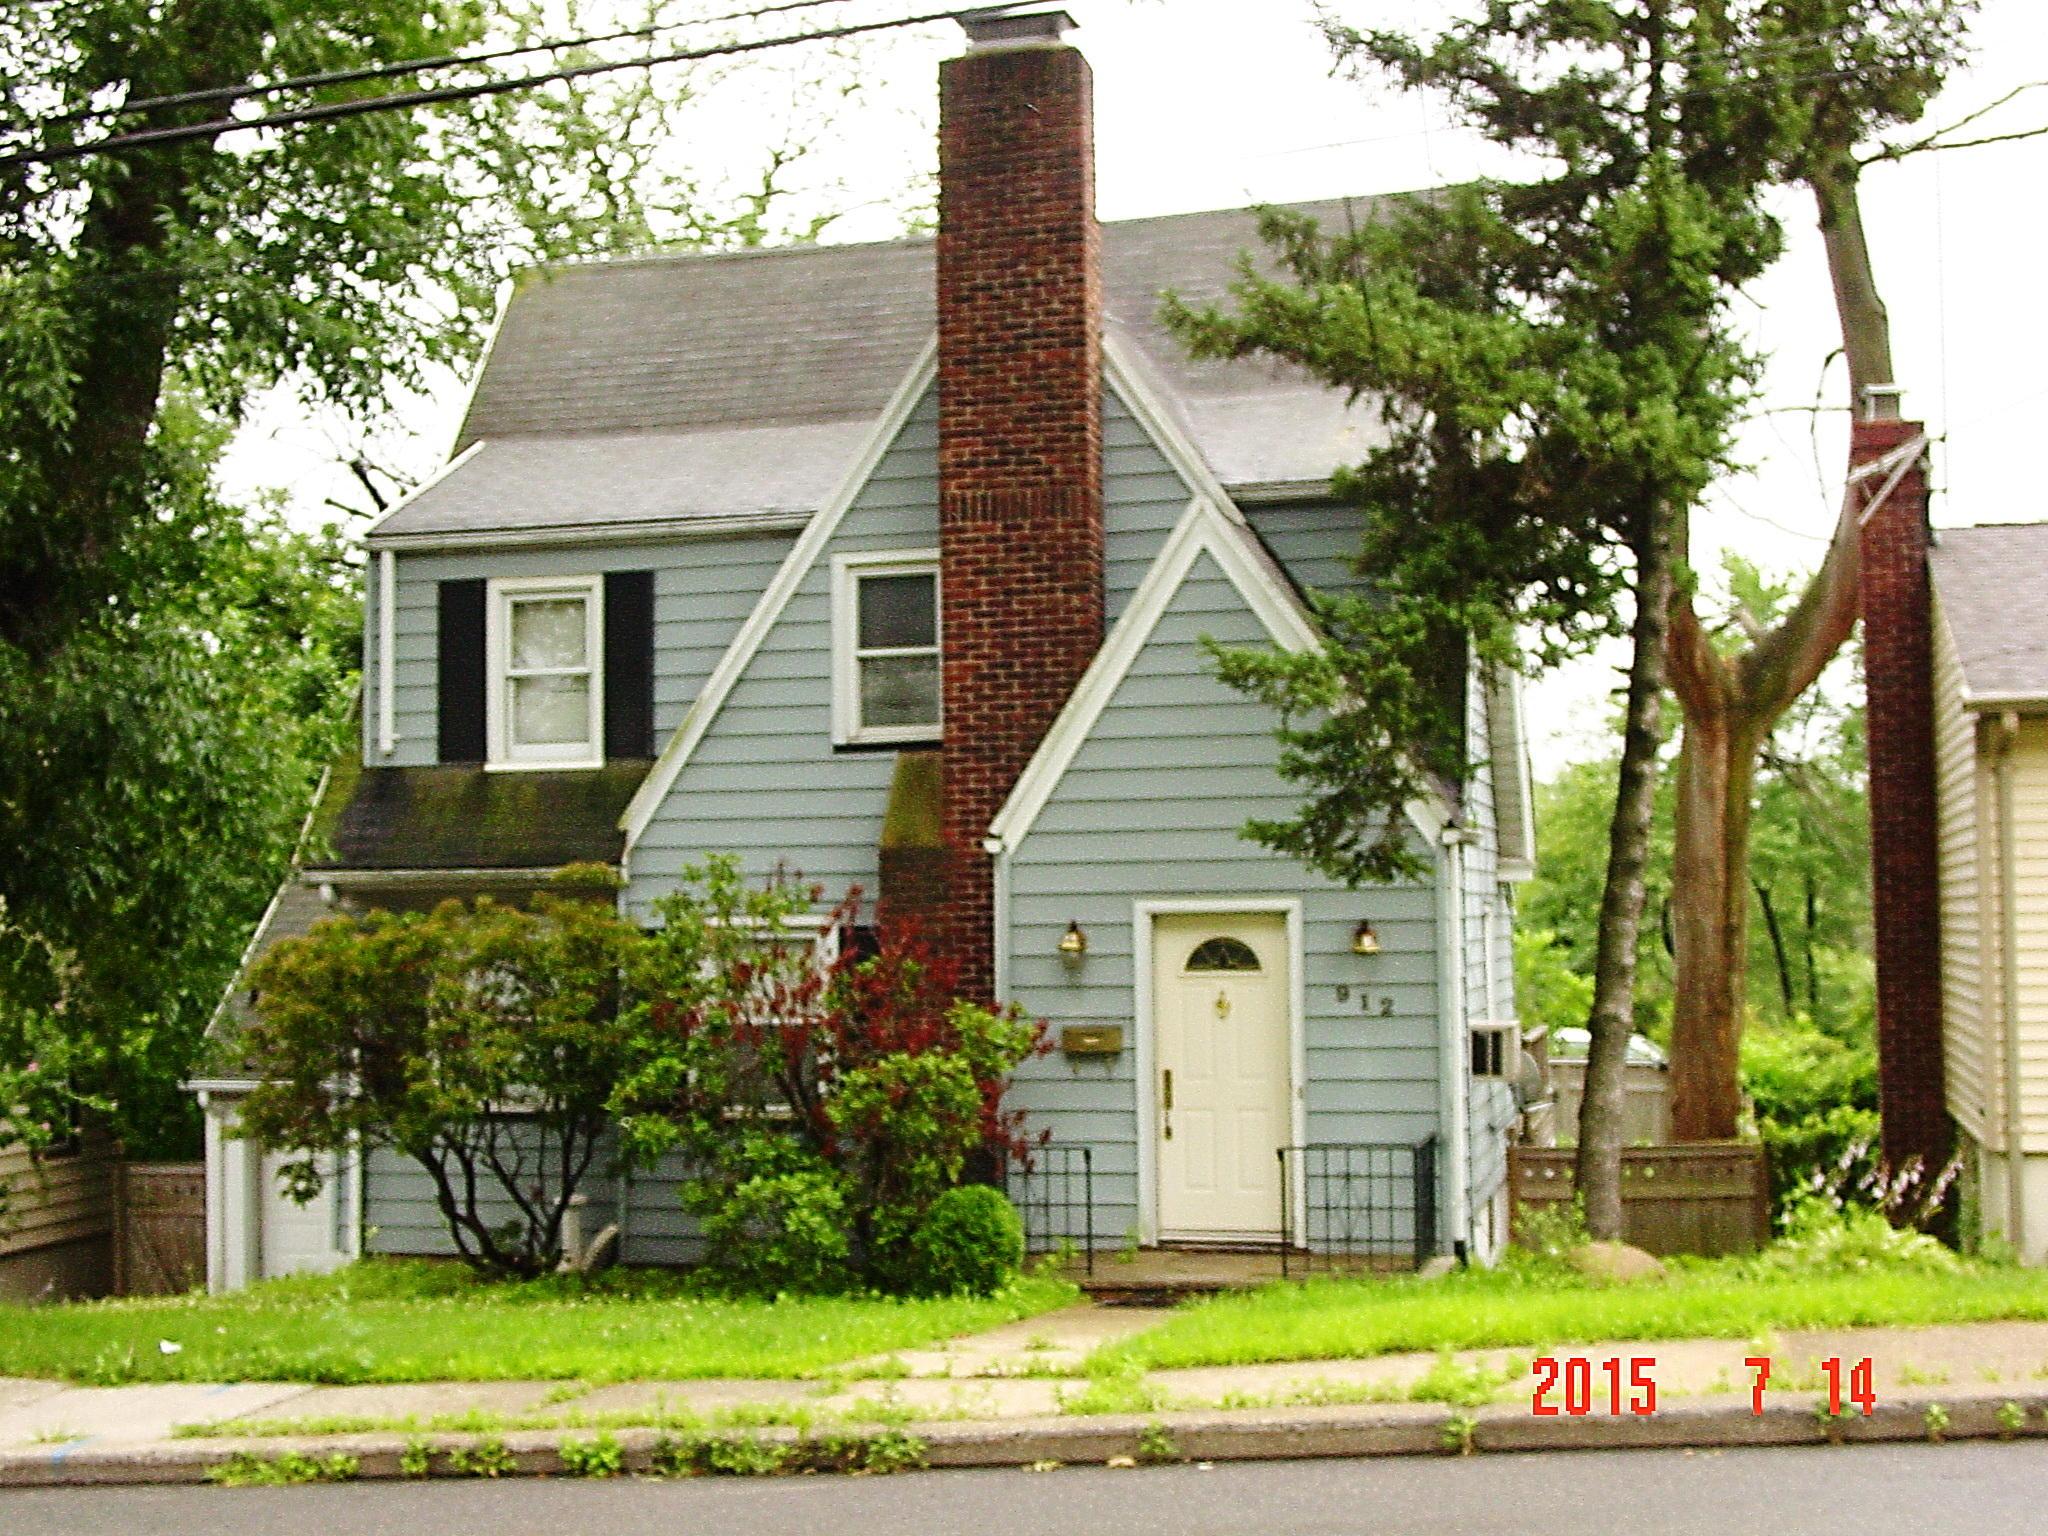 912 West Chestnut Street, Union NJ